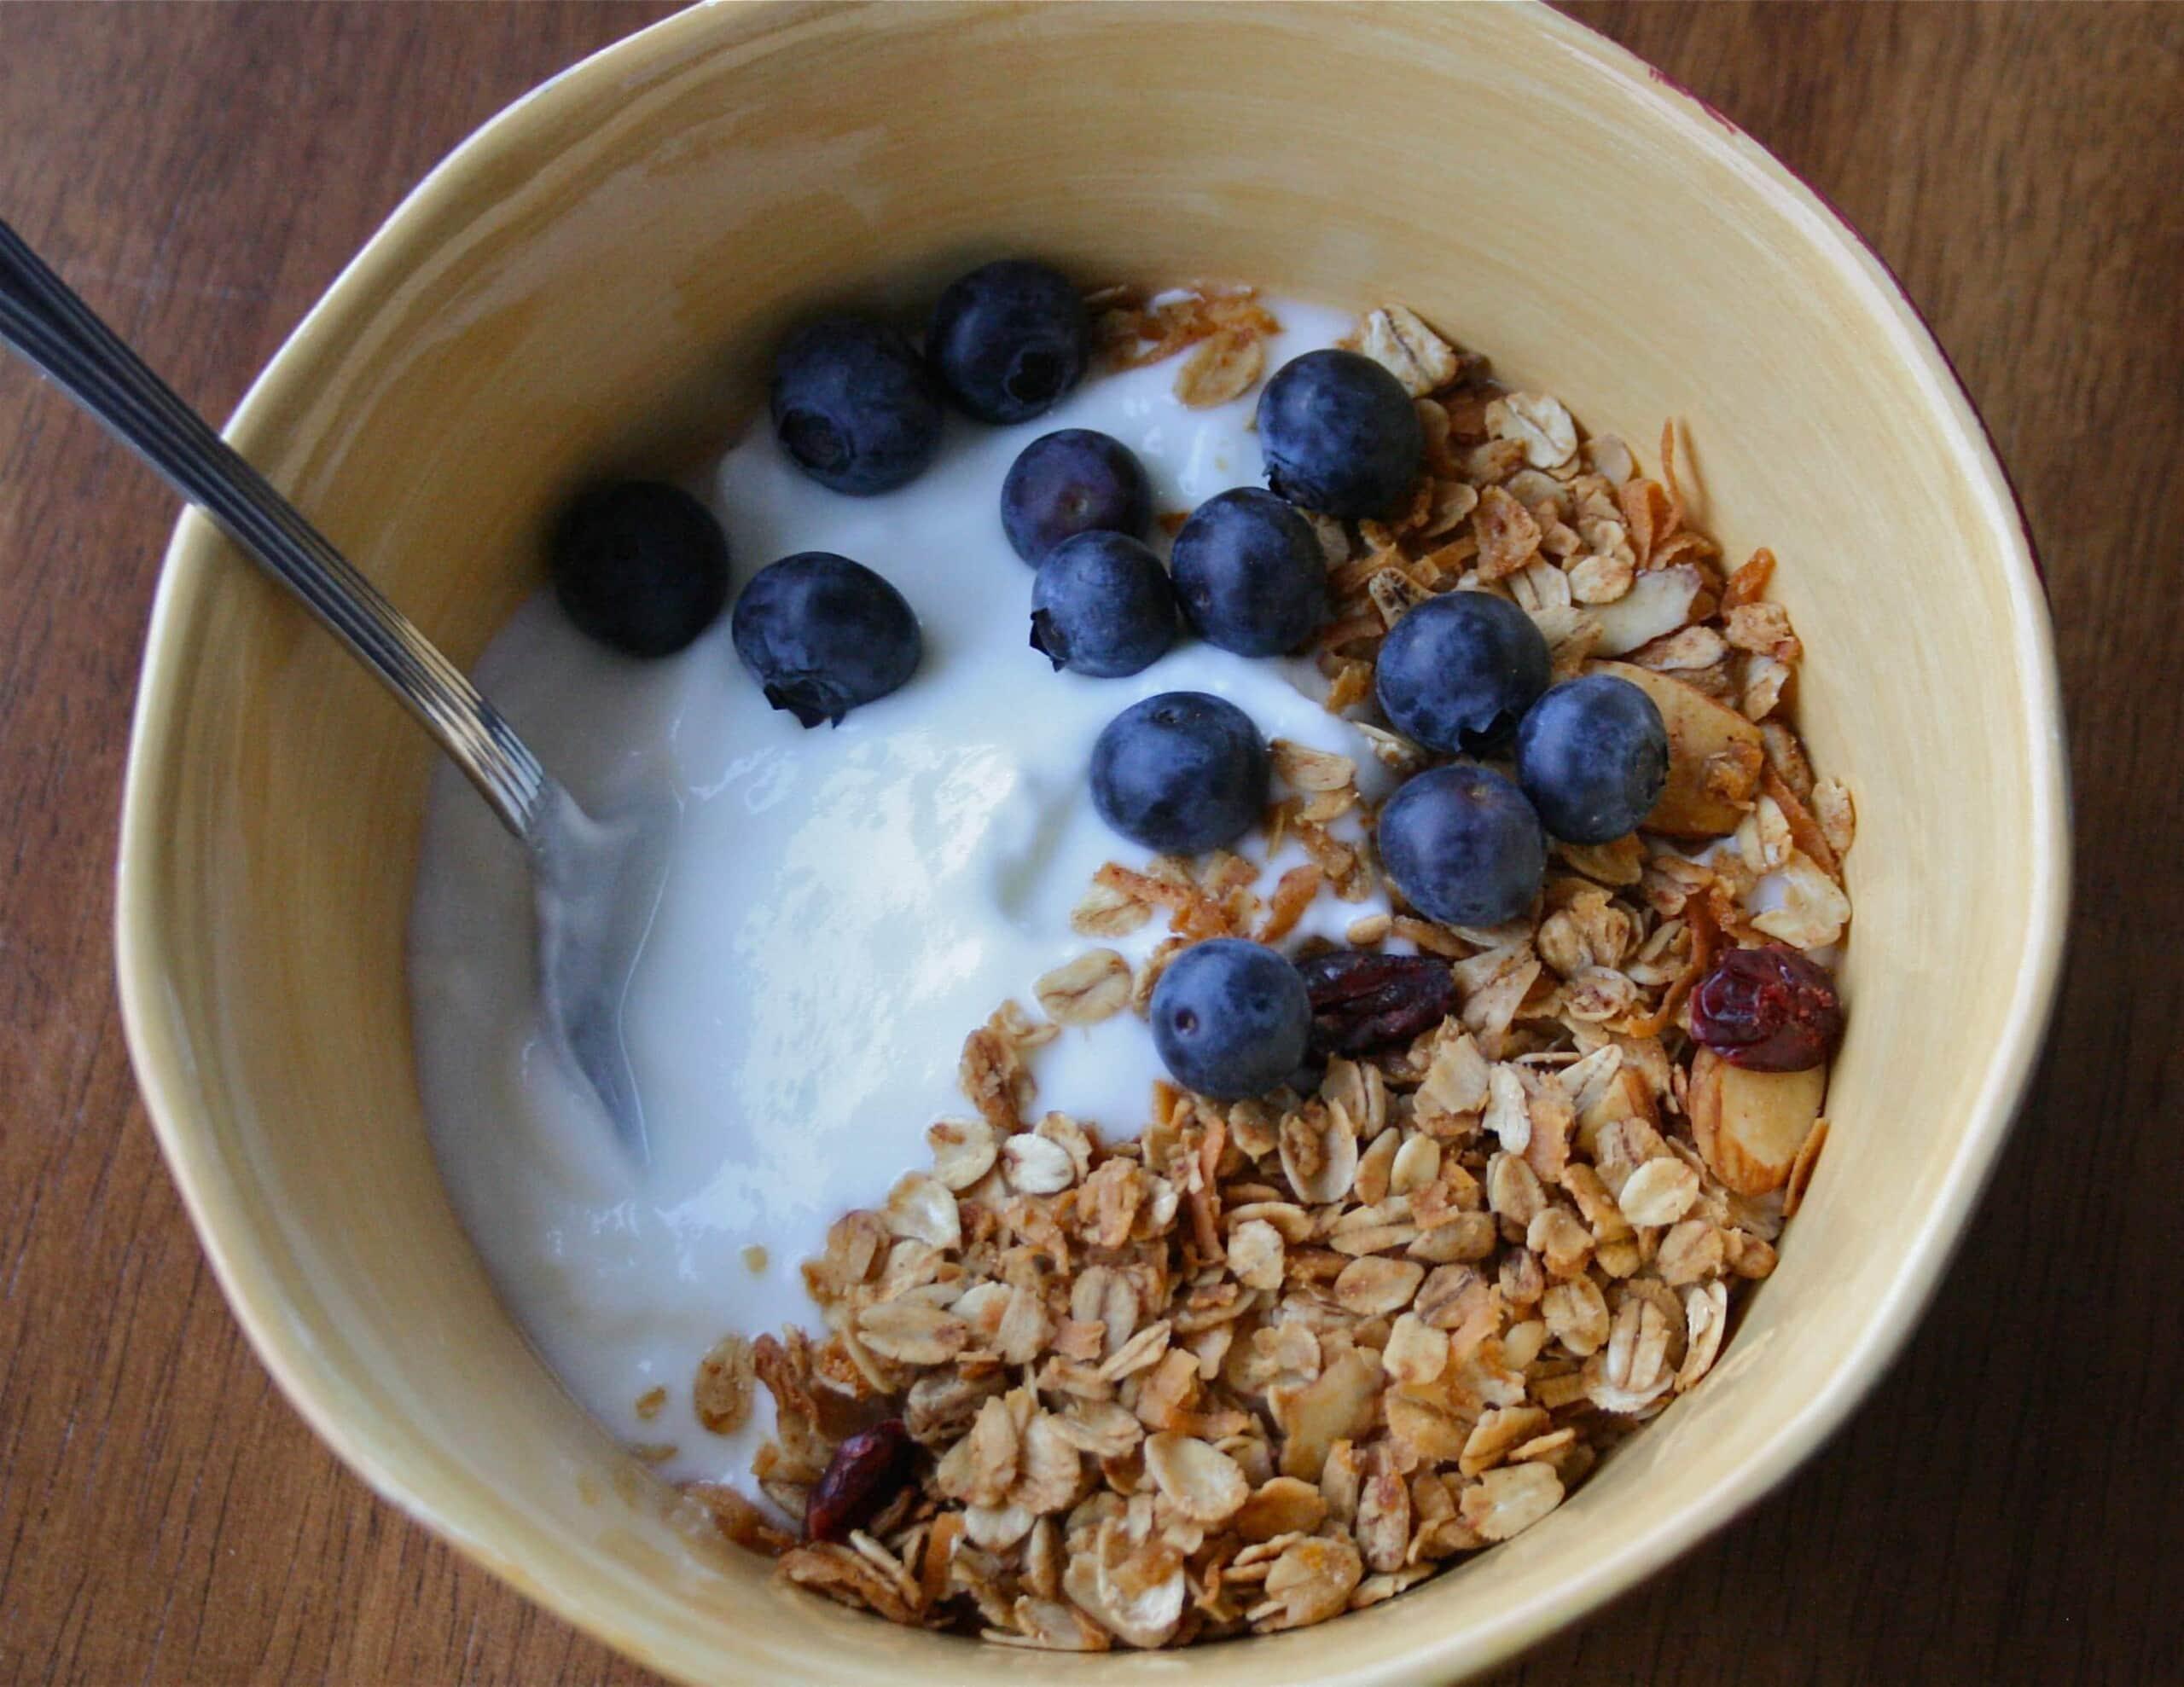 homemade greek yogurt with granola and blueberries